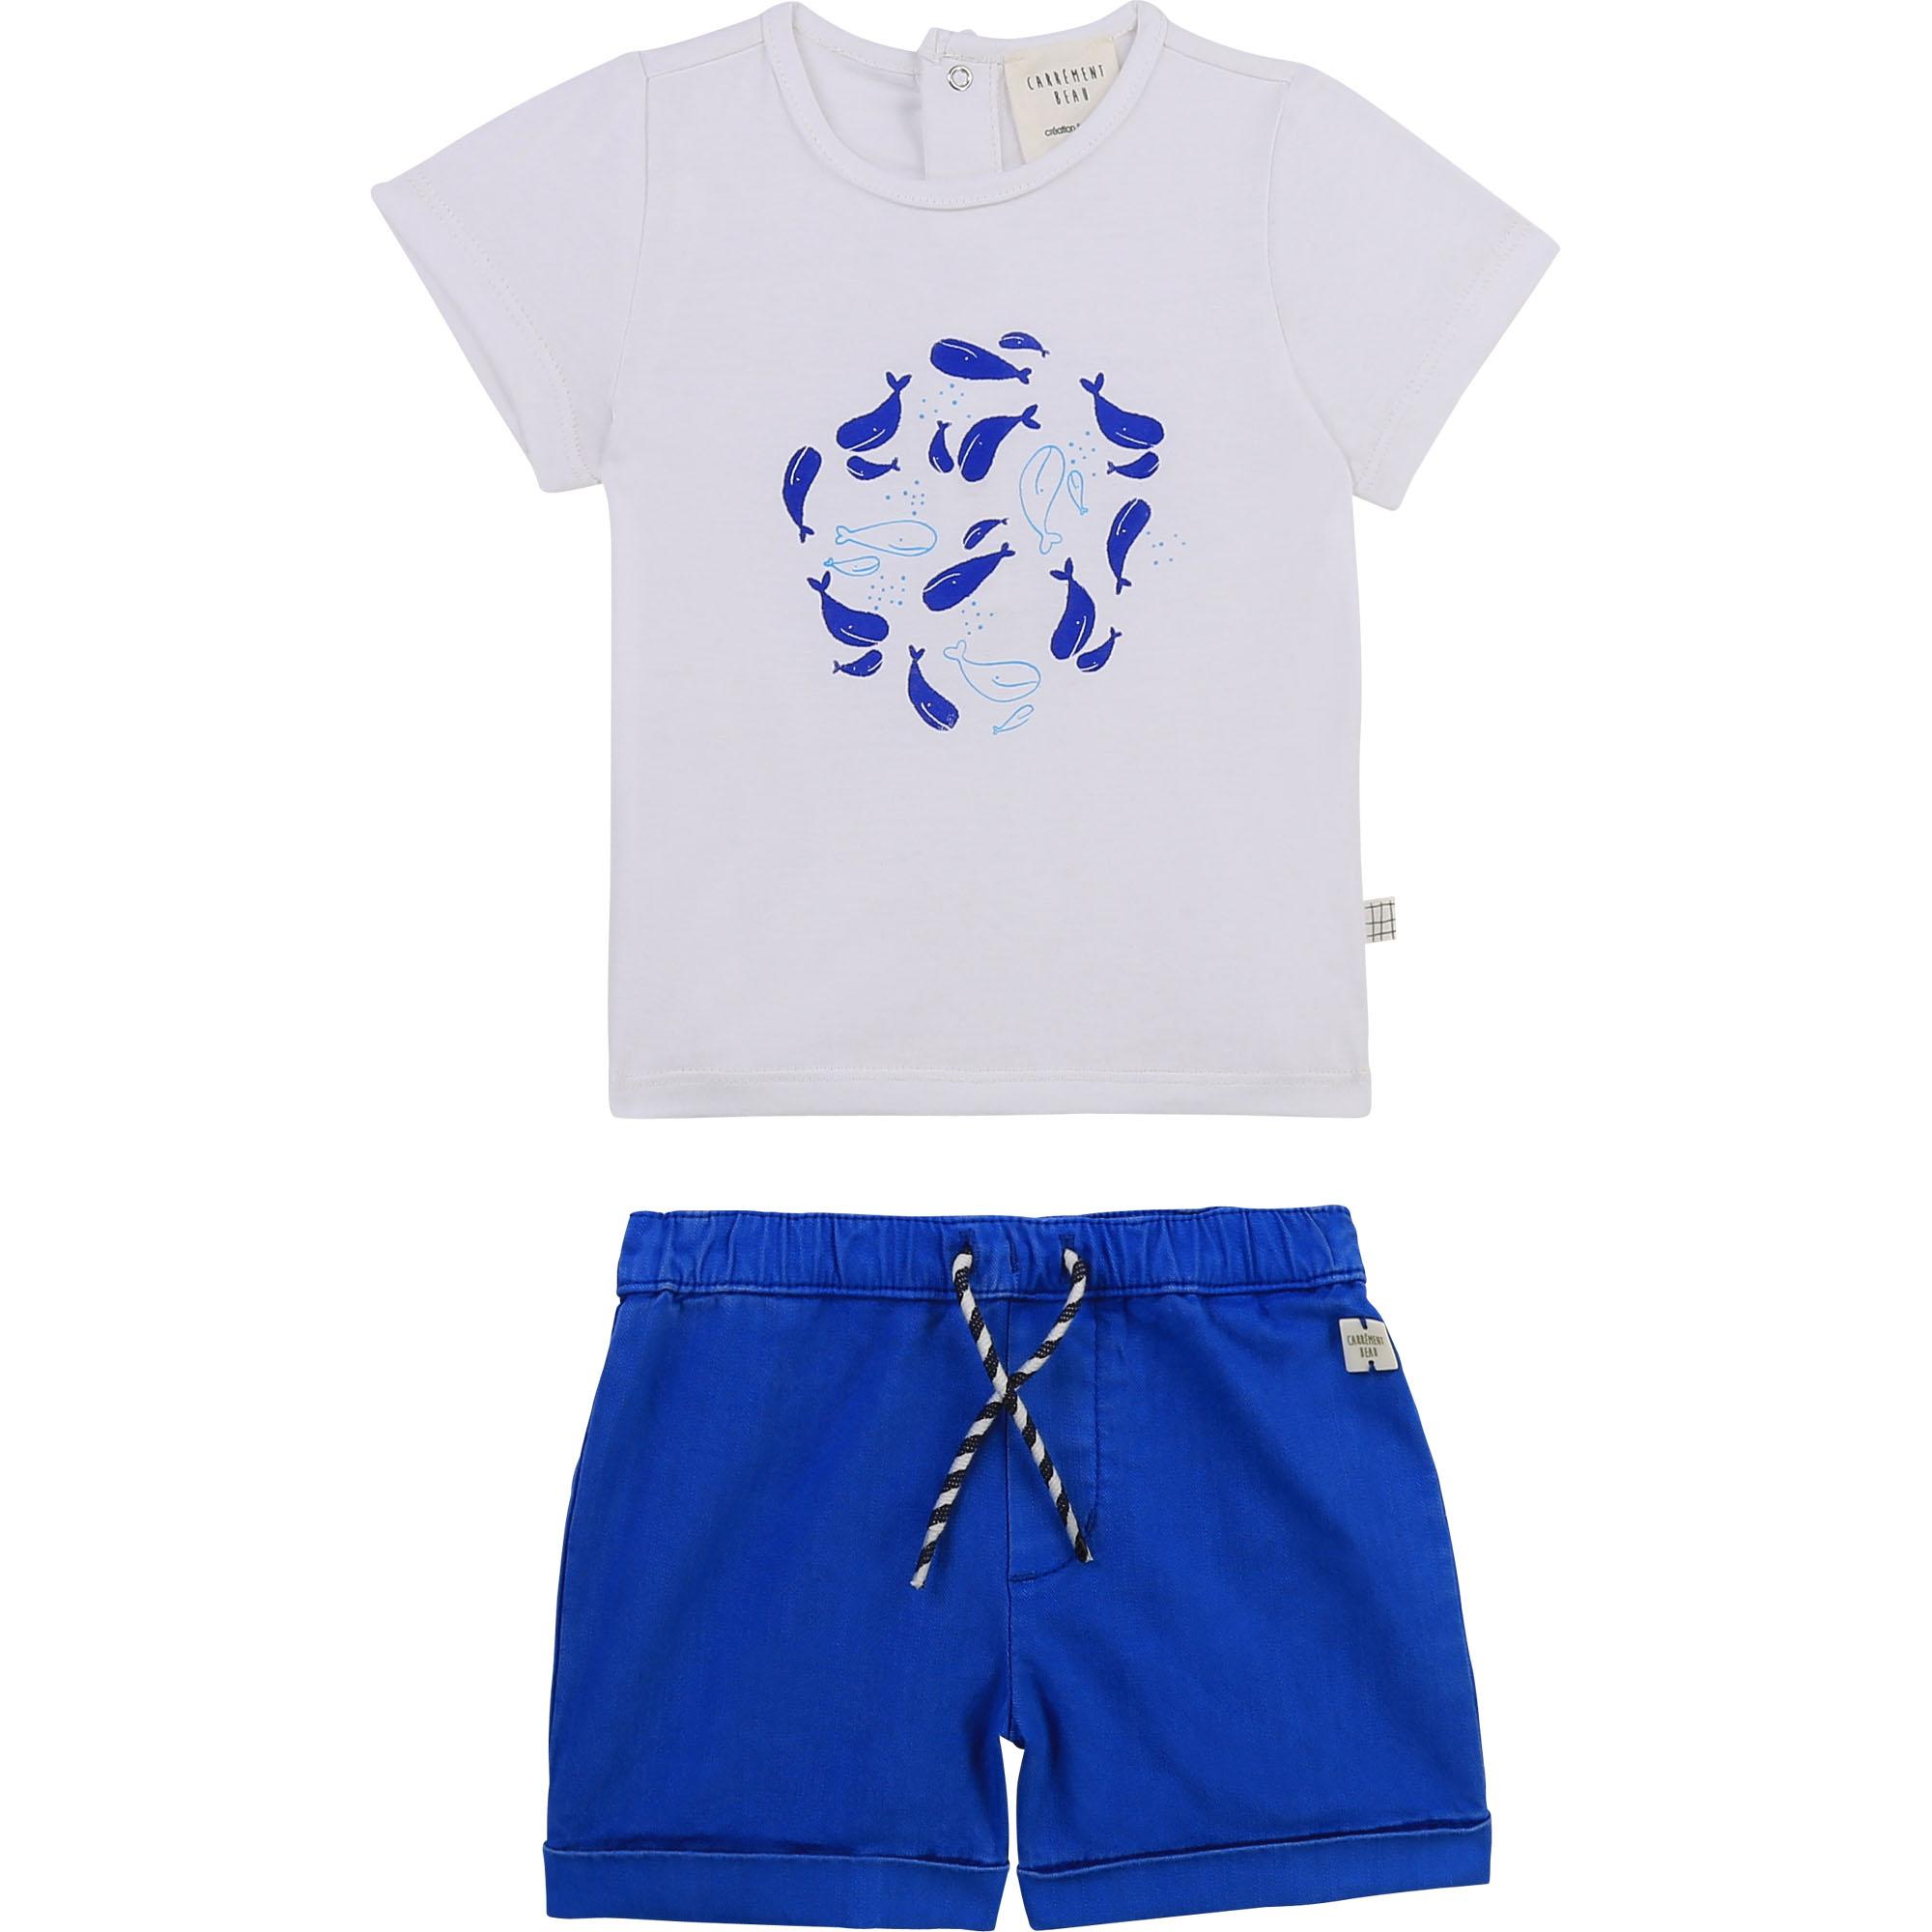 Cotton T-shirt and shorts set CARREMENT BEAU for BOY